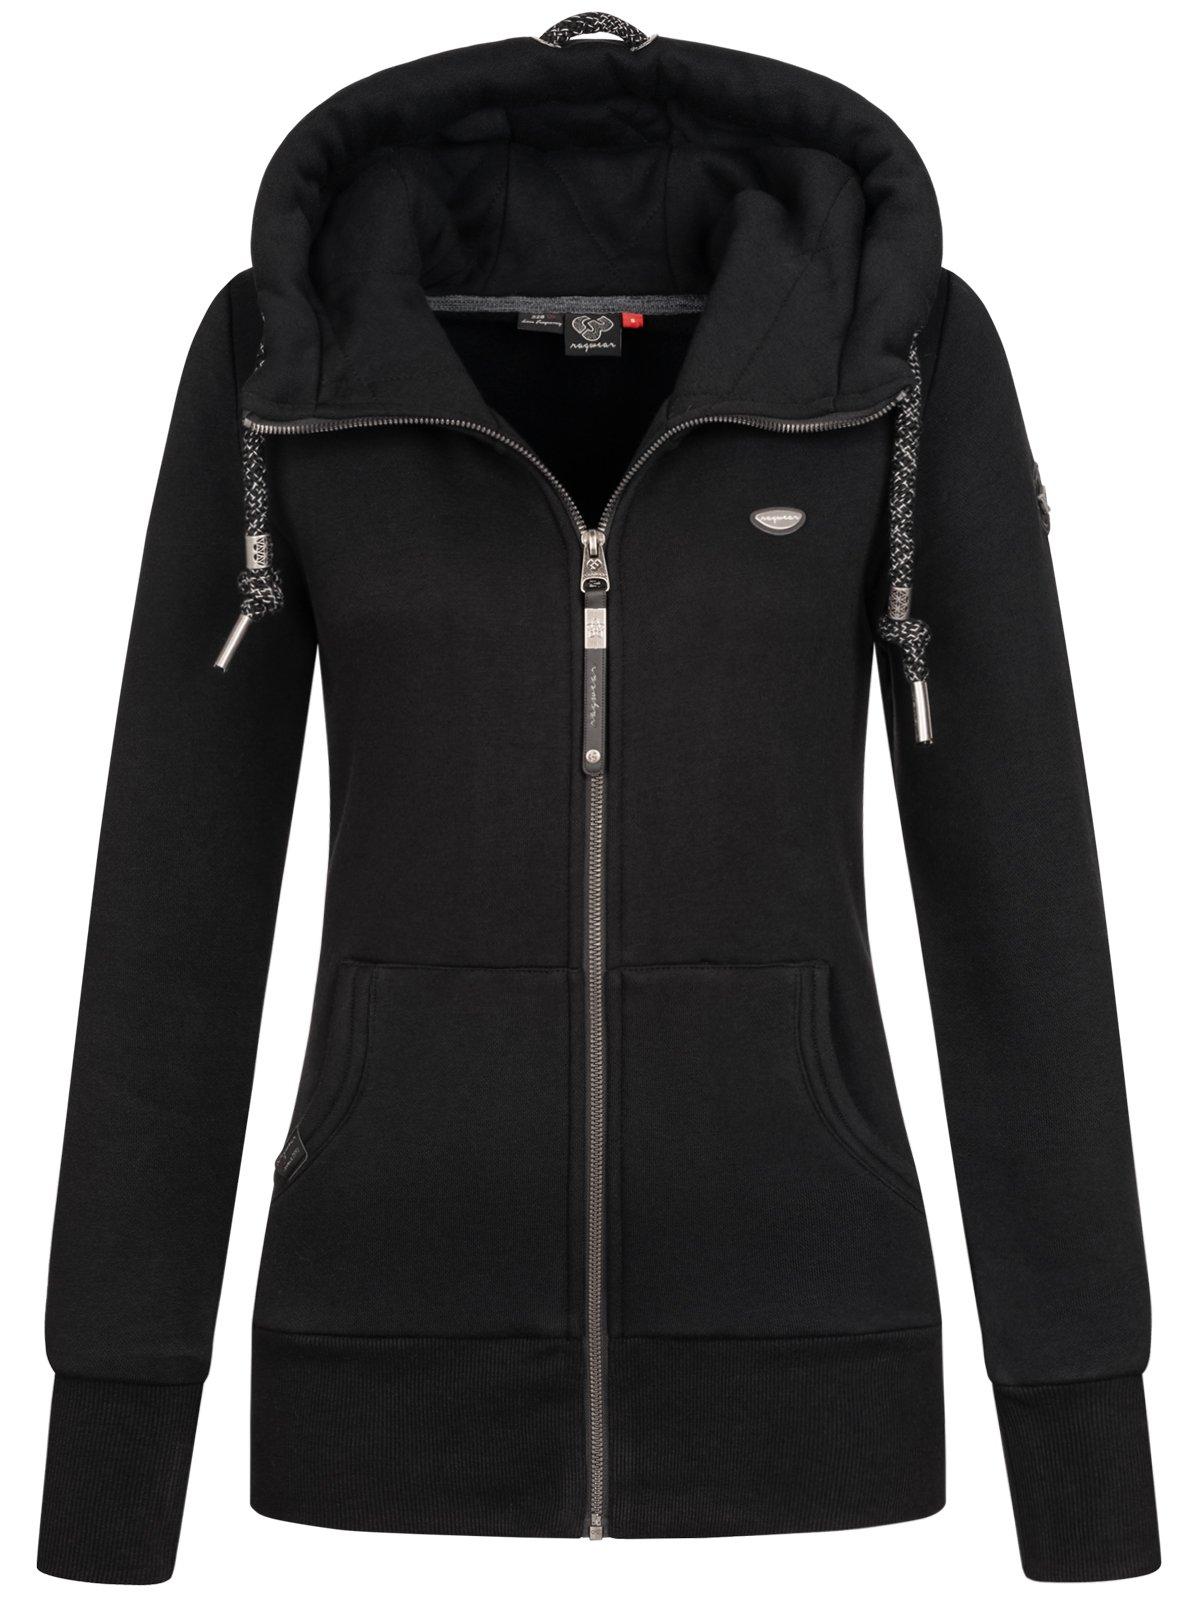 Ragwear Damen Sweatjacke Jacke Sweater Kapuze Damenjacke vegan Neska Zip